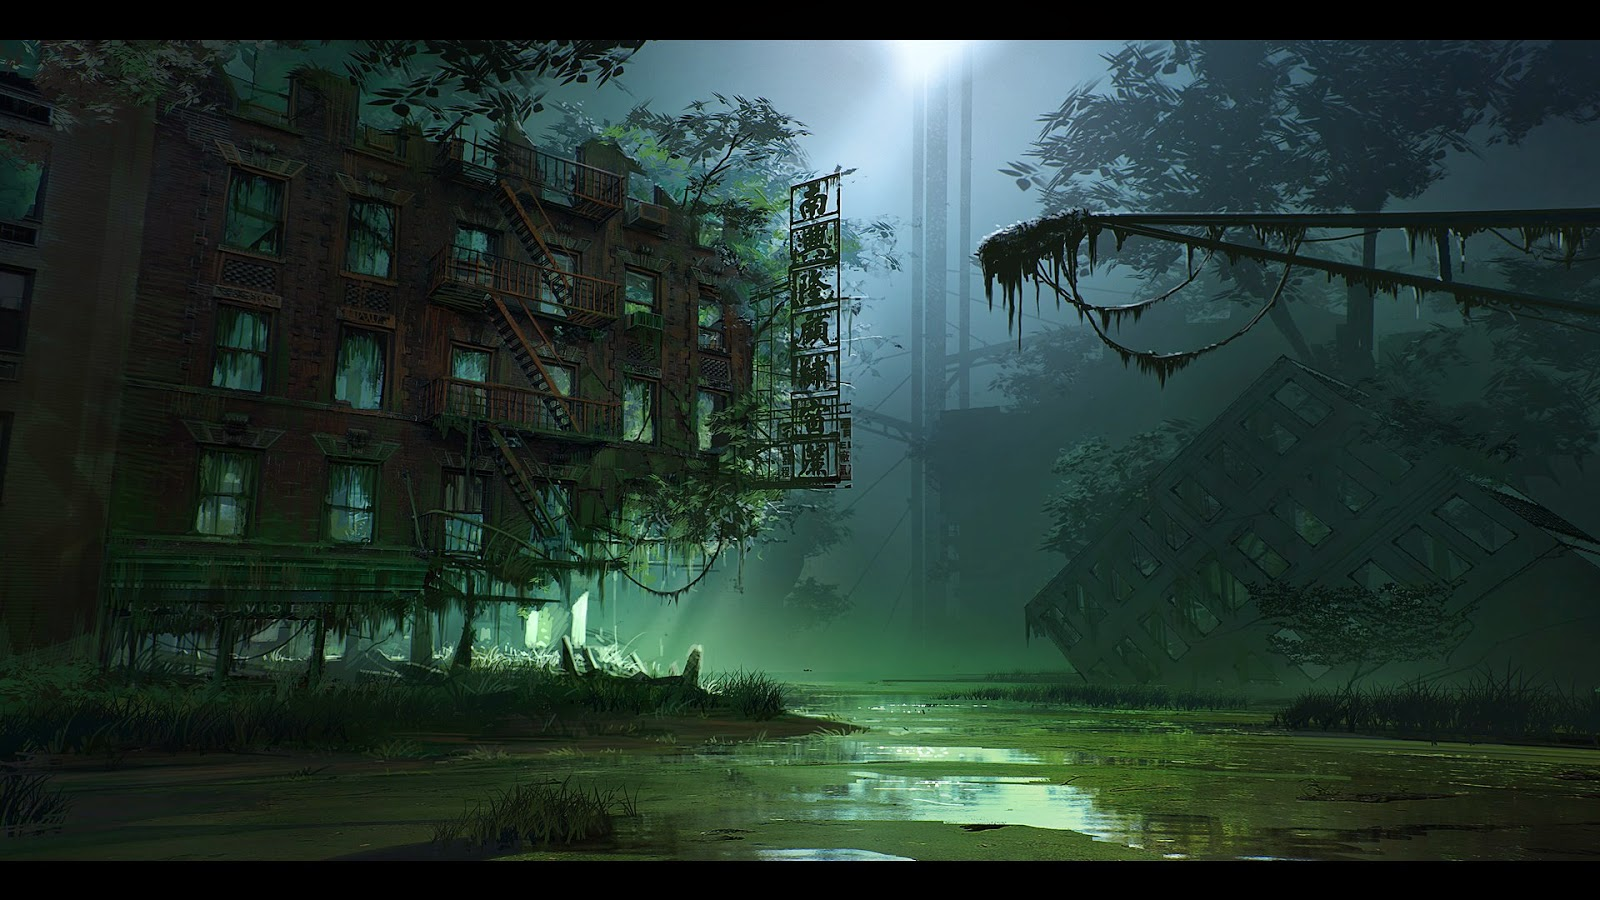 29 swamp hd wallpaper on wallpapersafari - Hd wallpapers of darkness ...